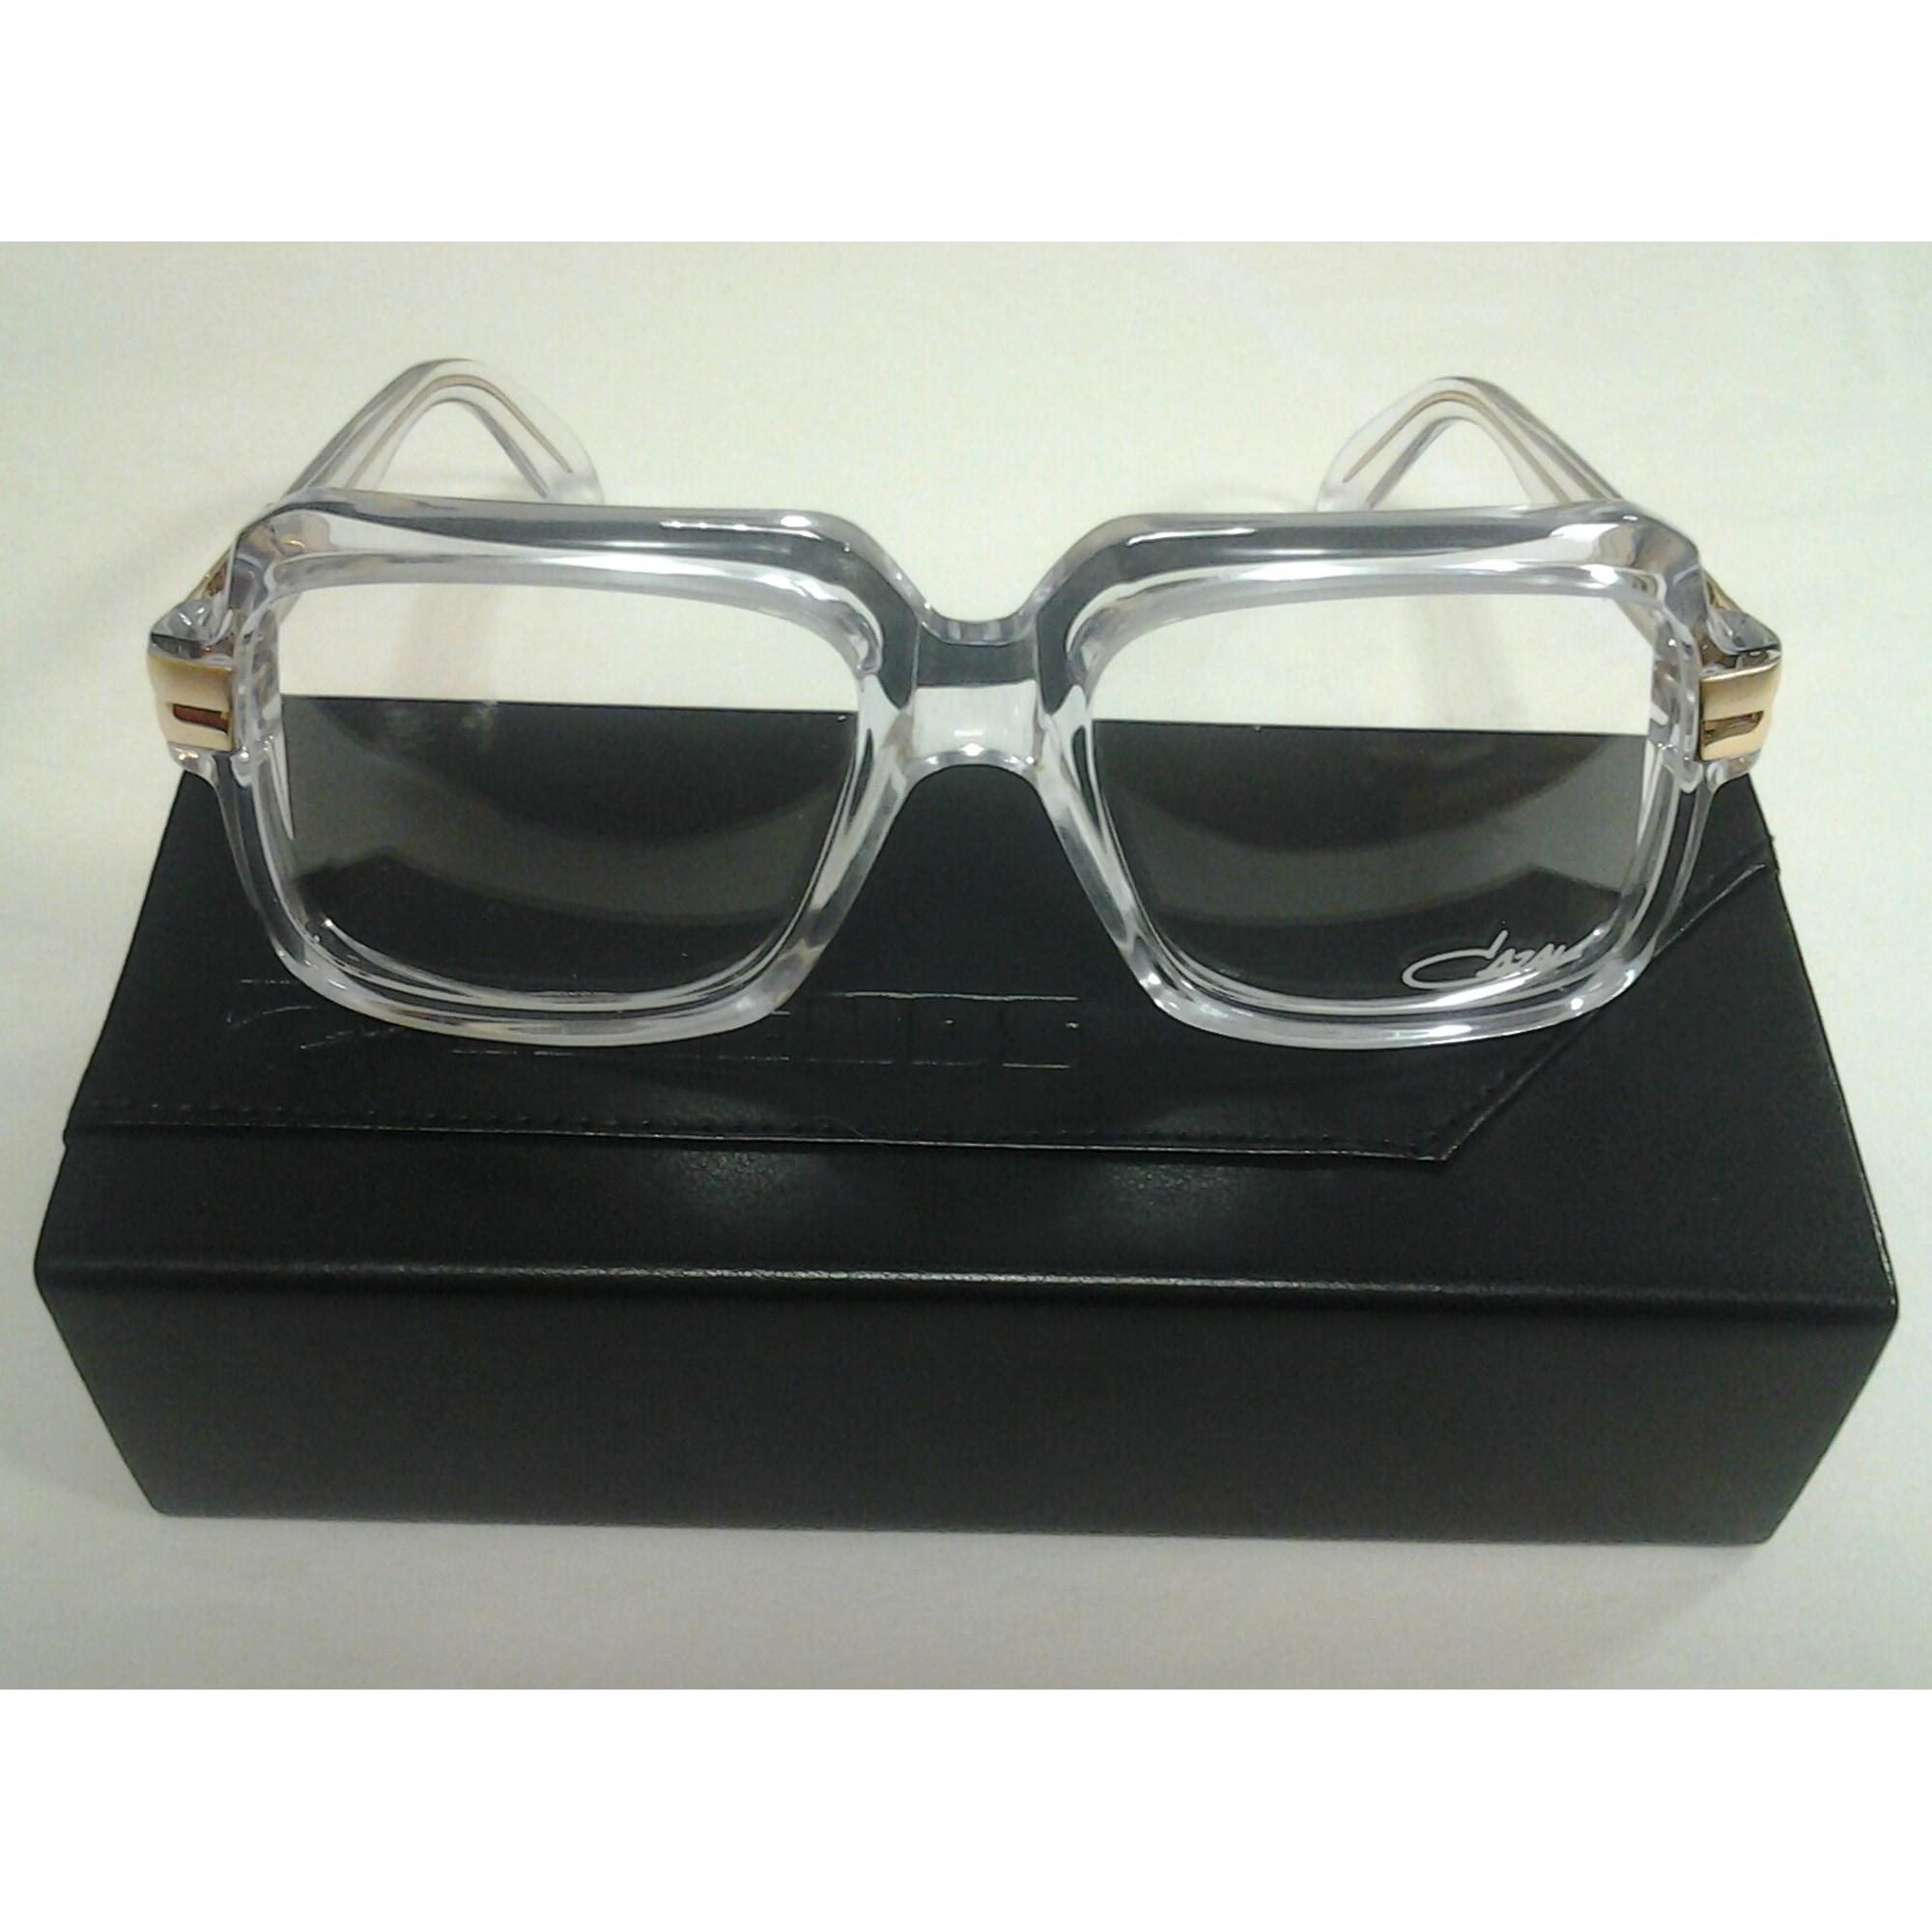 a45a90cba72d84 Monture de lunettes CAZAL EYEWEAR transparent   or - 2001100